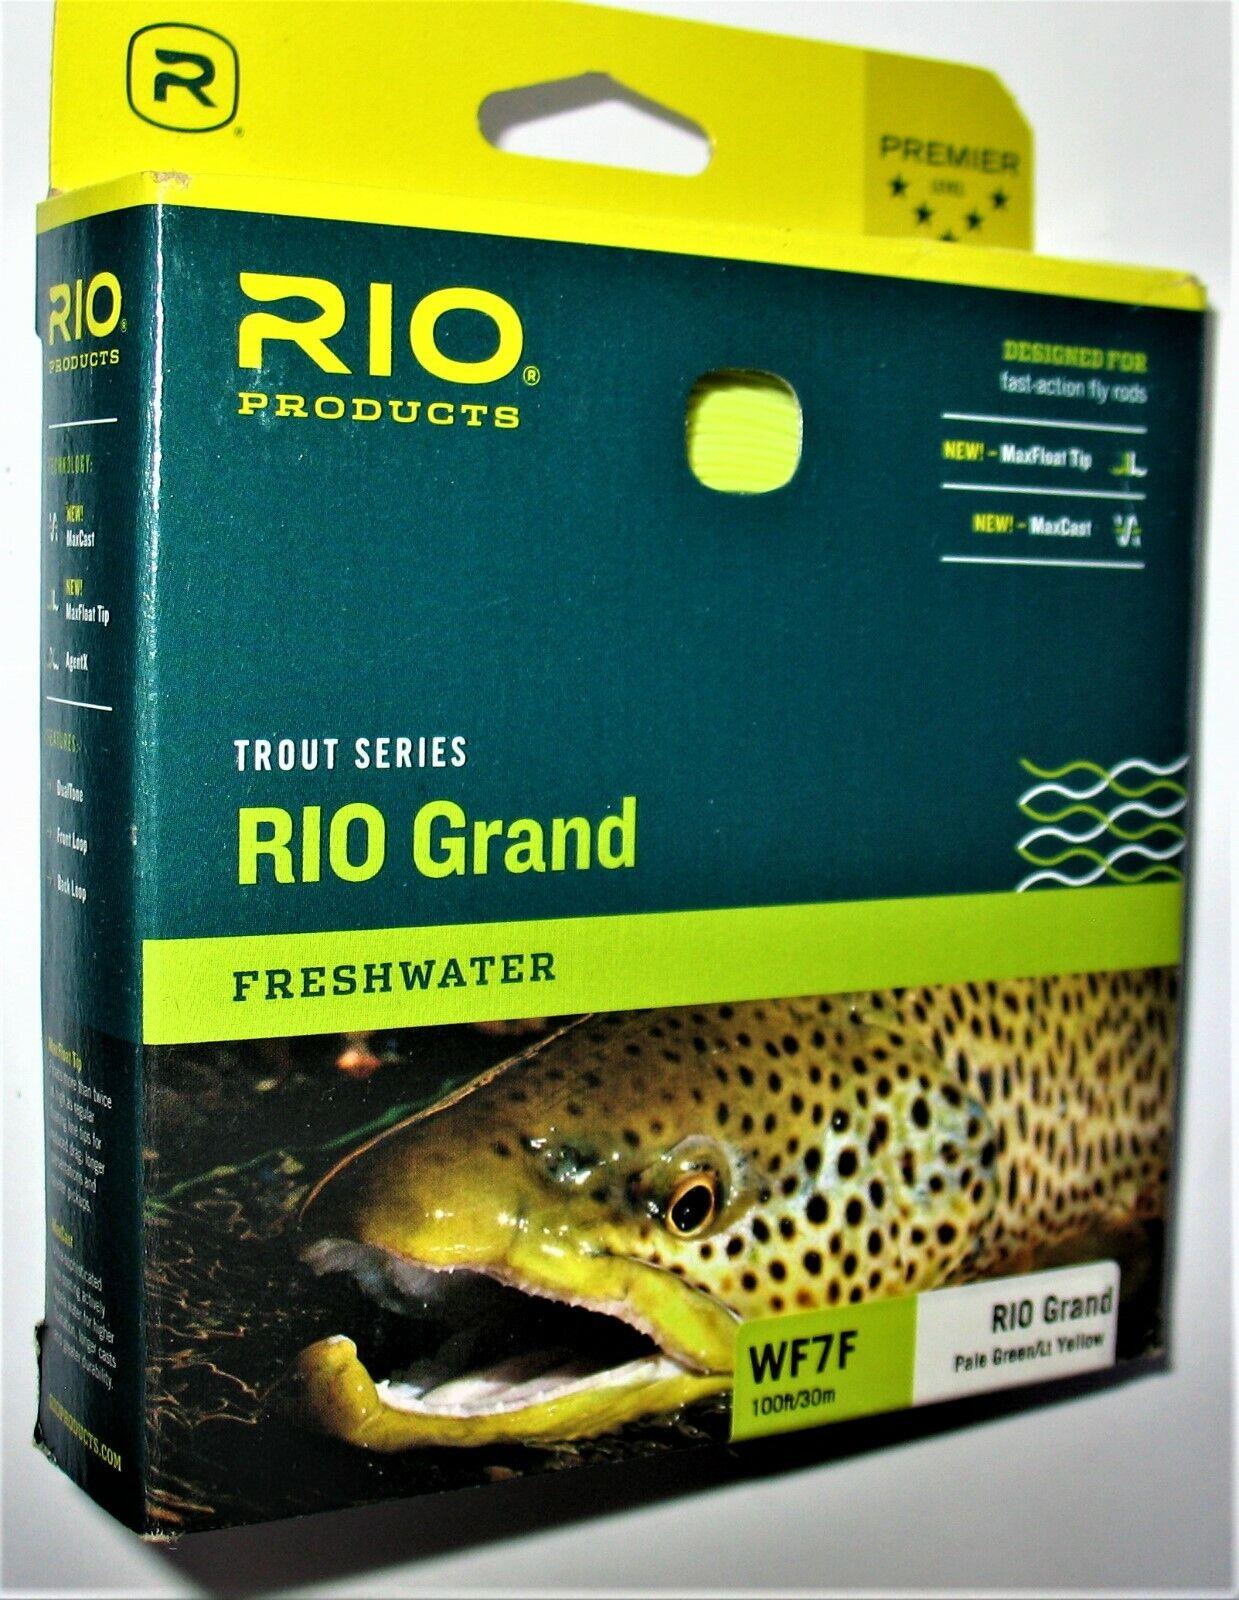 RIO TROUT SERIES RIO Gre WF7F & WF8F gratuito WARP SPEED SHIPPING FREAKY FASSTTT